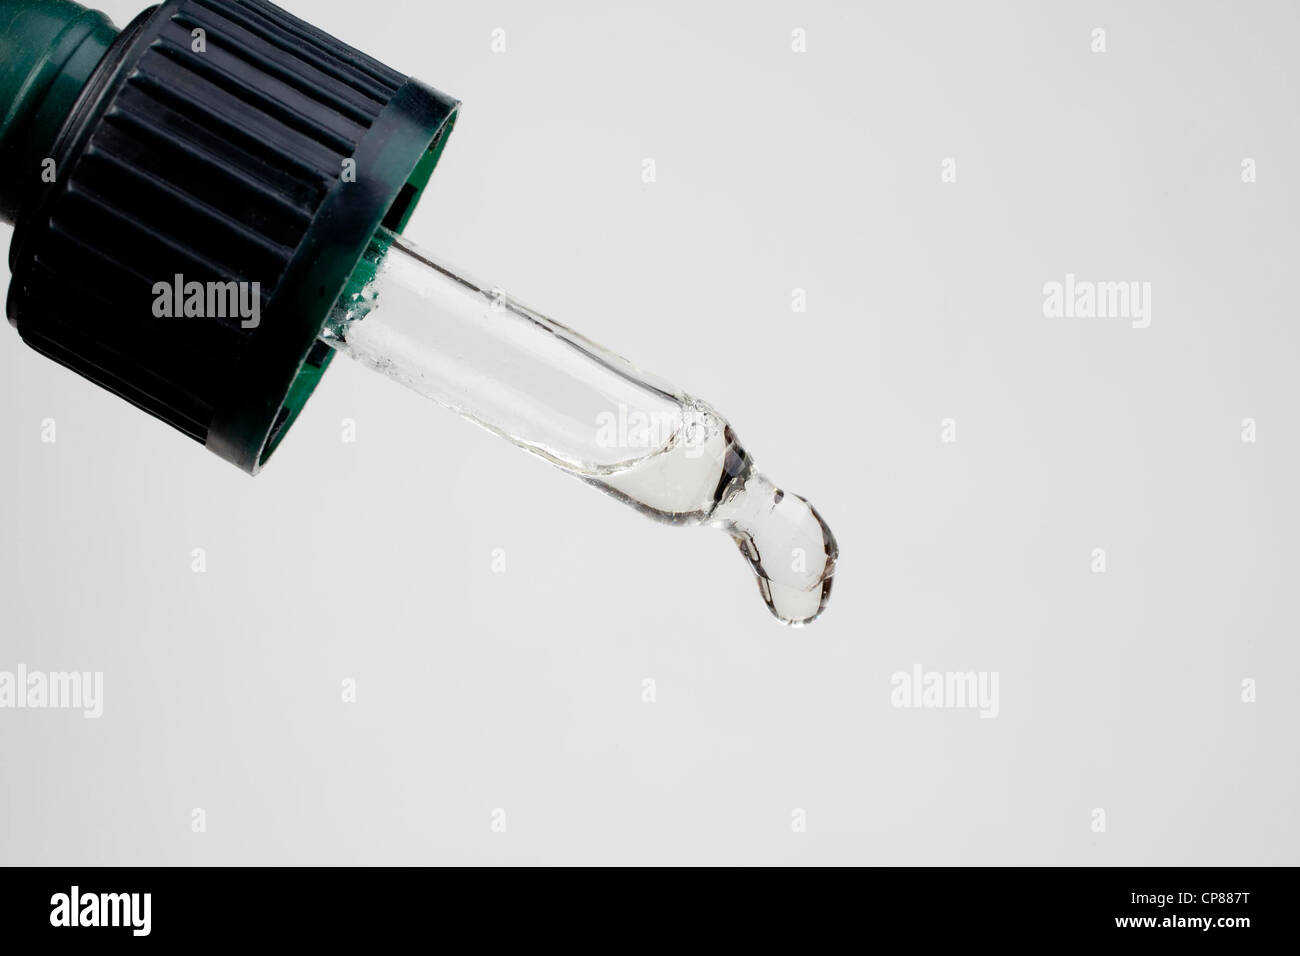 Pipette of a medicine bottle, Pipette einer Medizinflasche Stock Photo